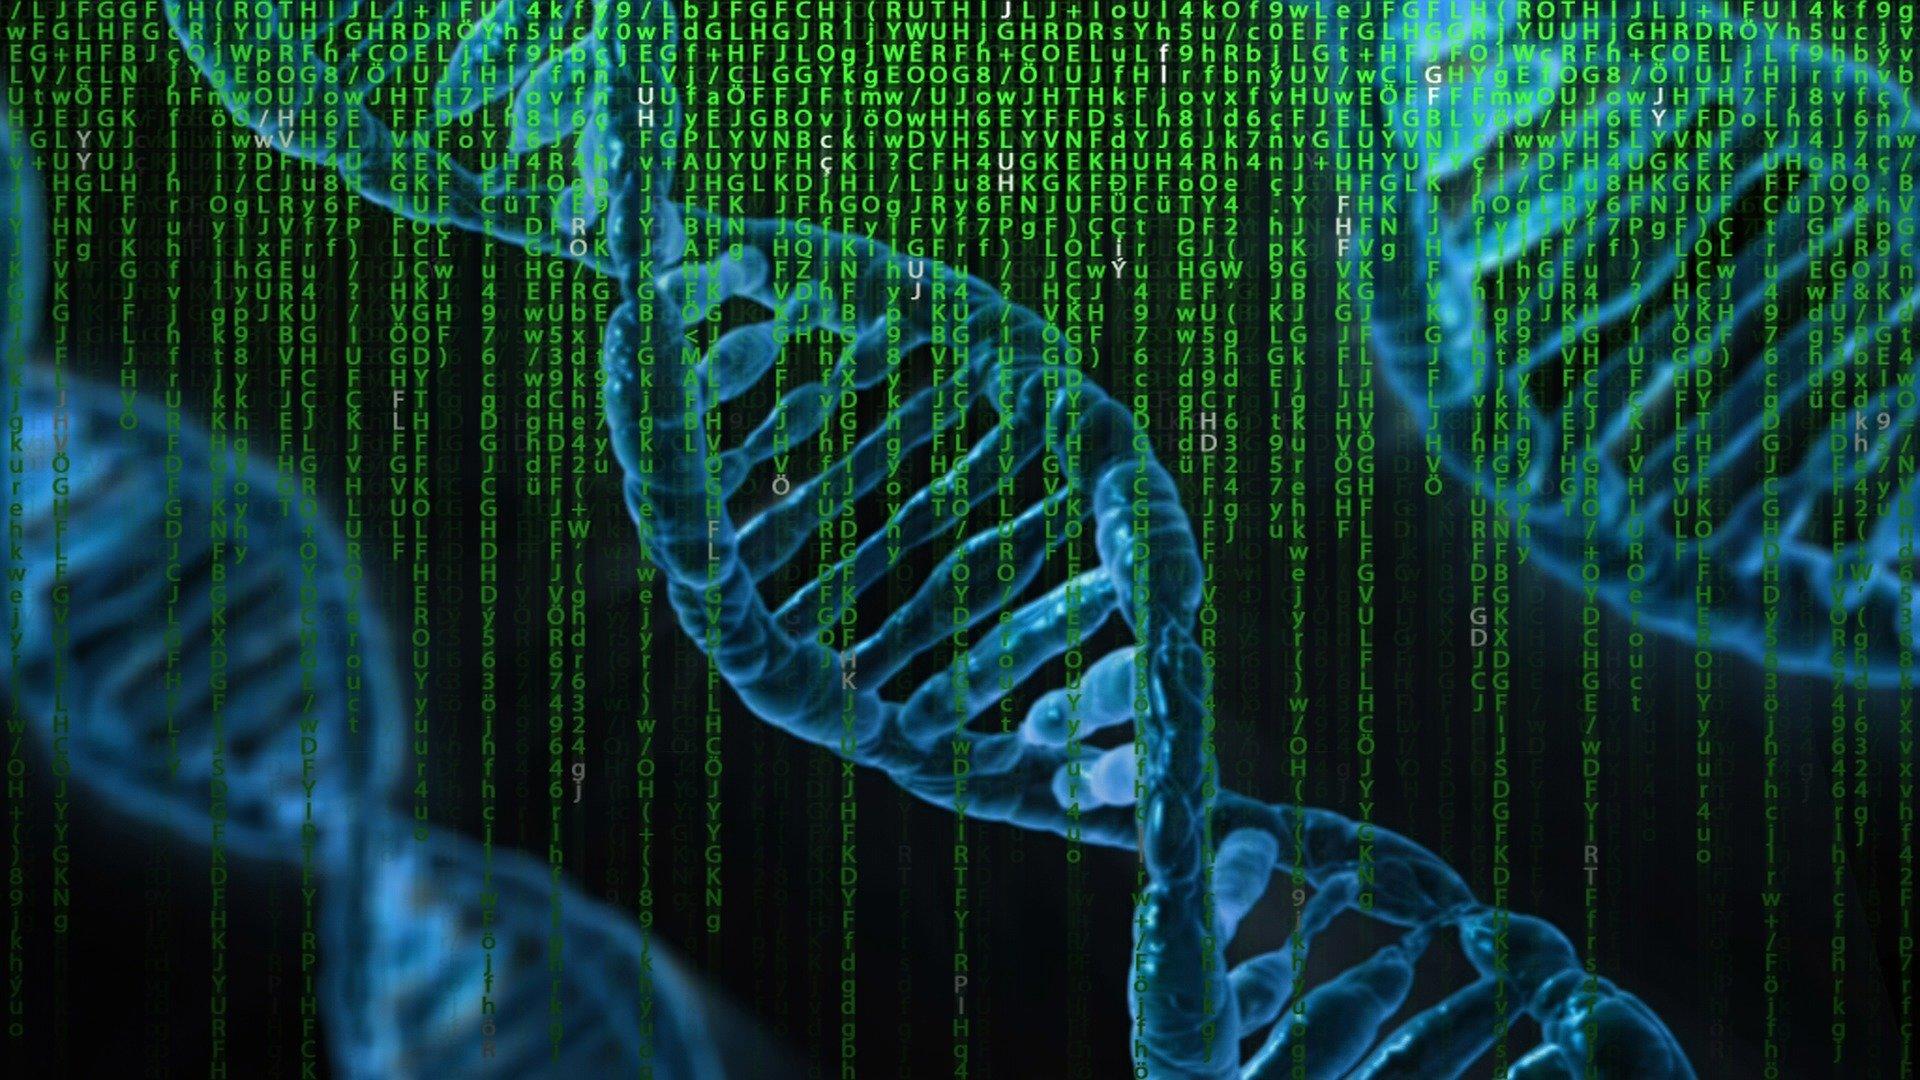 Entenda CRISPR-Cas: técnica da engenharia genética para alterar o DNA dos seres vivos